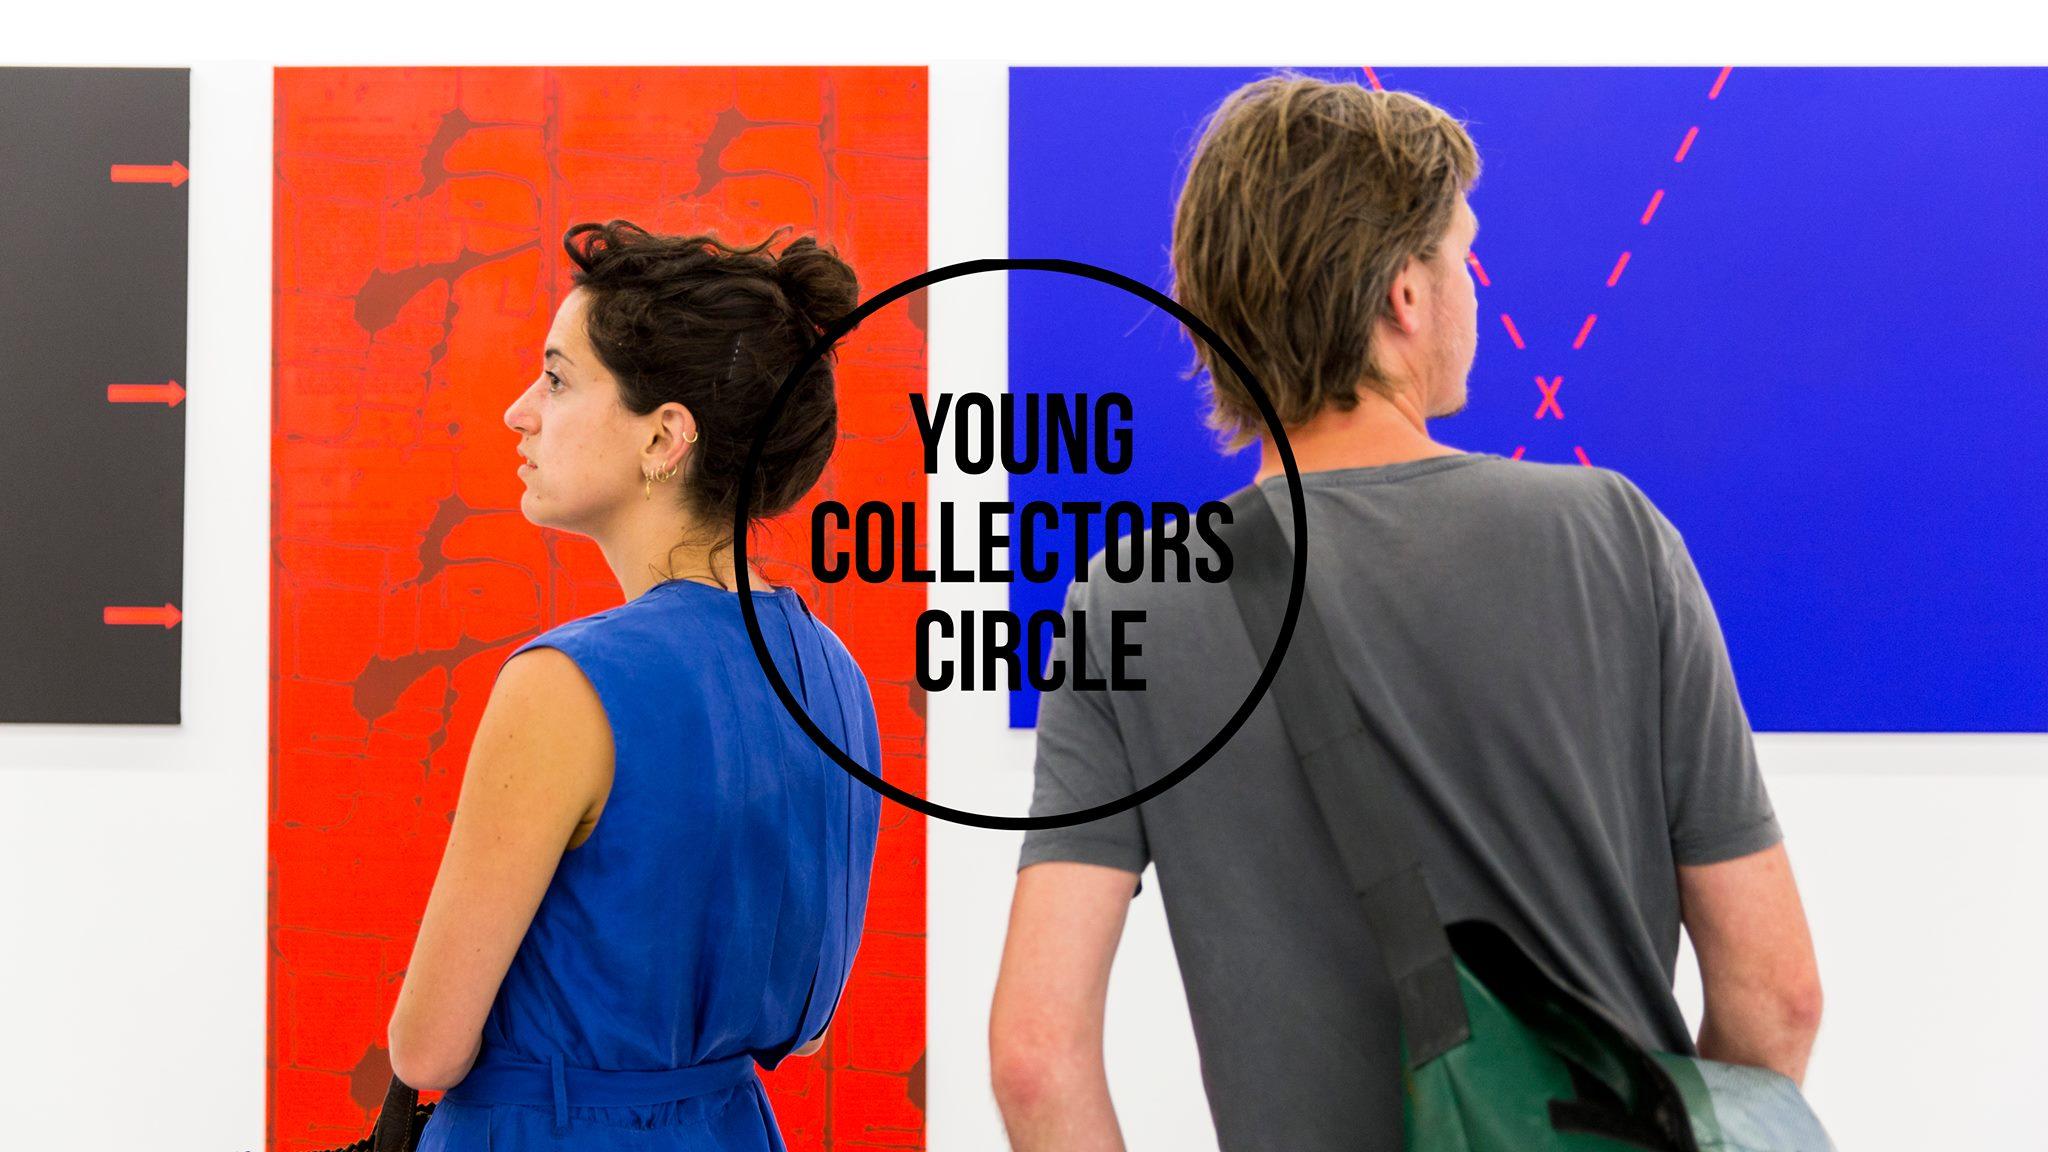 Kijkdagpreview VENDU ROTTERDAM x YOUNG COLLECTORS CIRCLE donderdagavond 16 mei